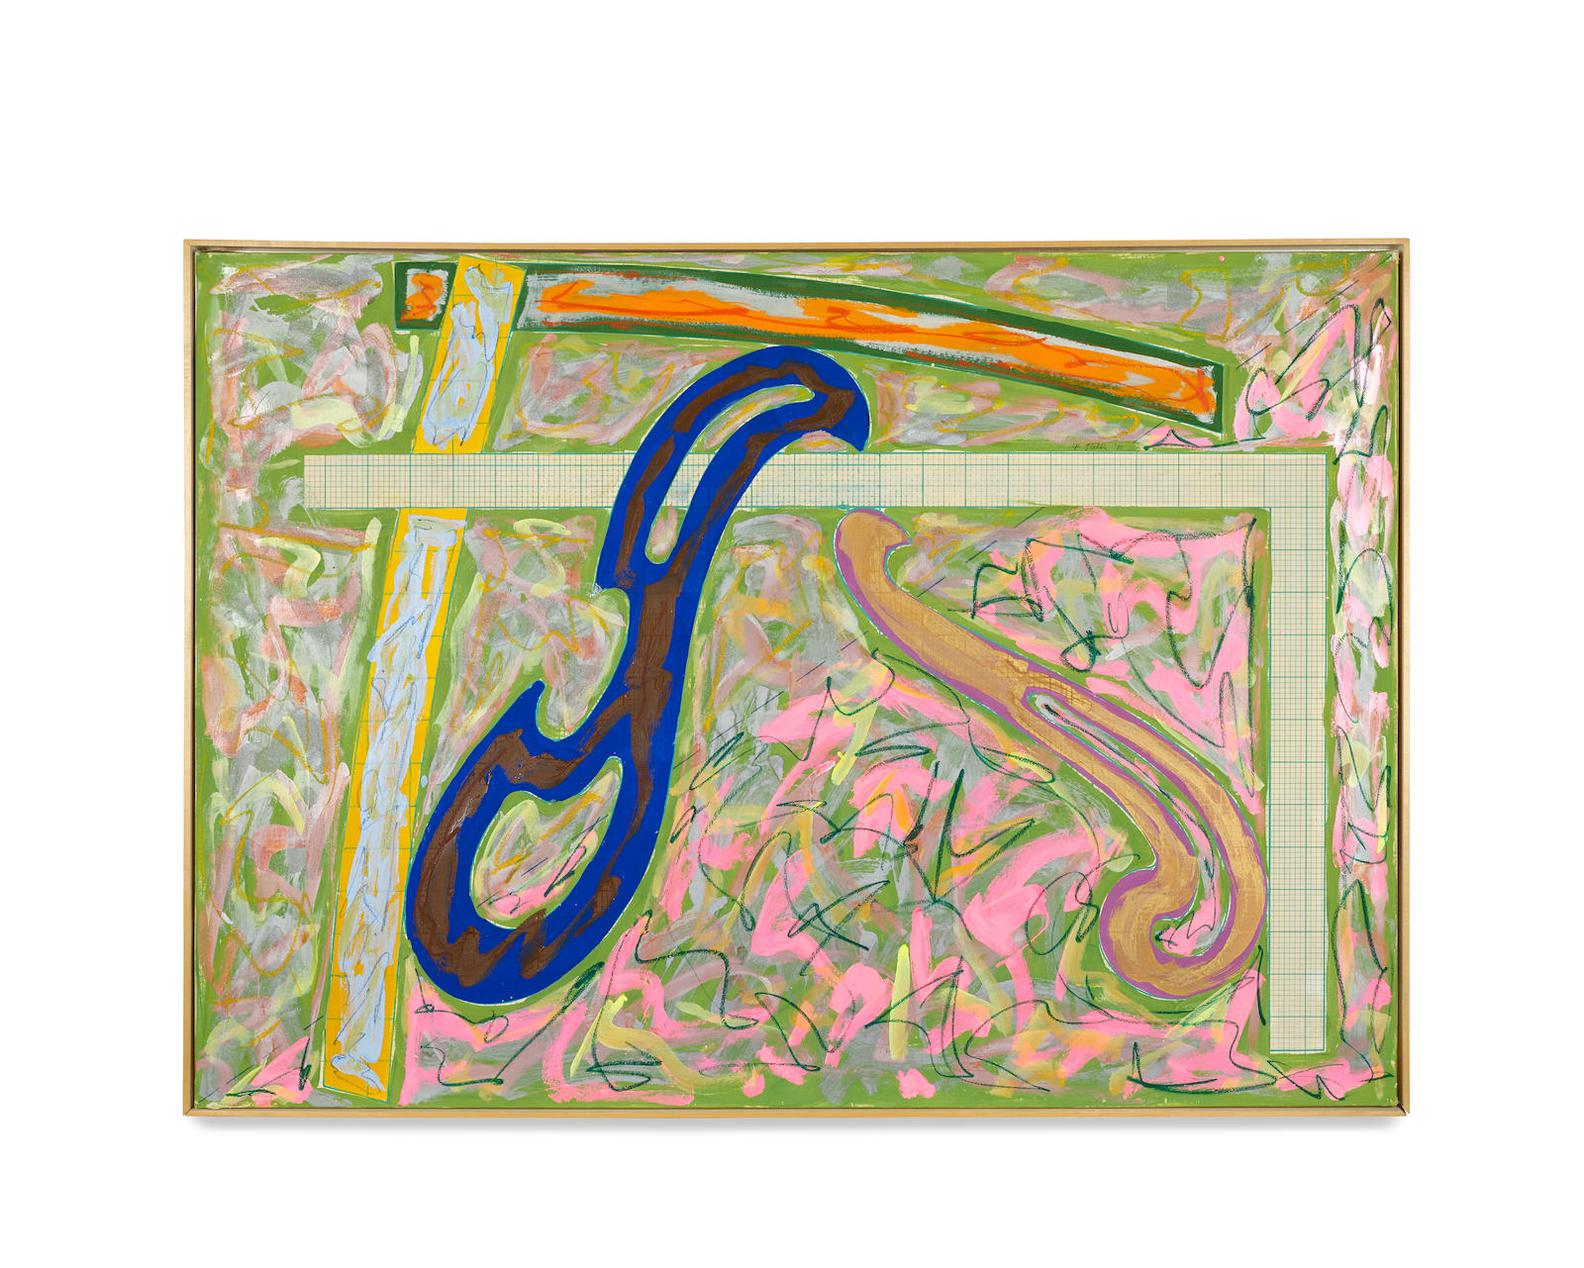 Frank Stella-Green Solitaire-1981